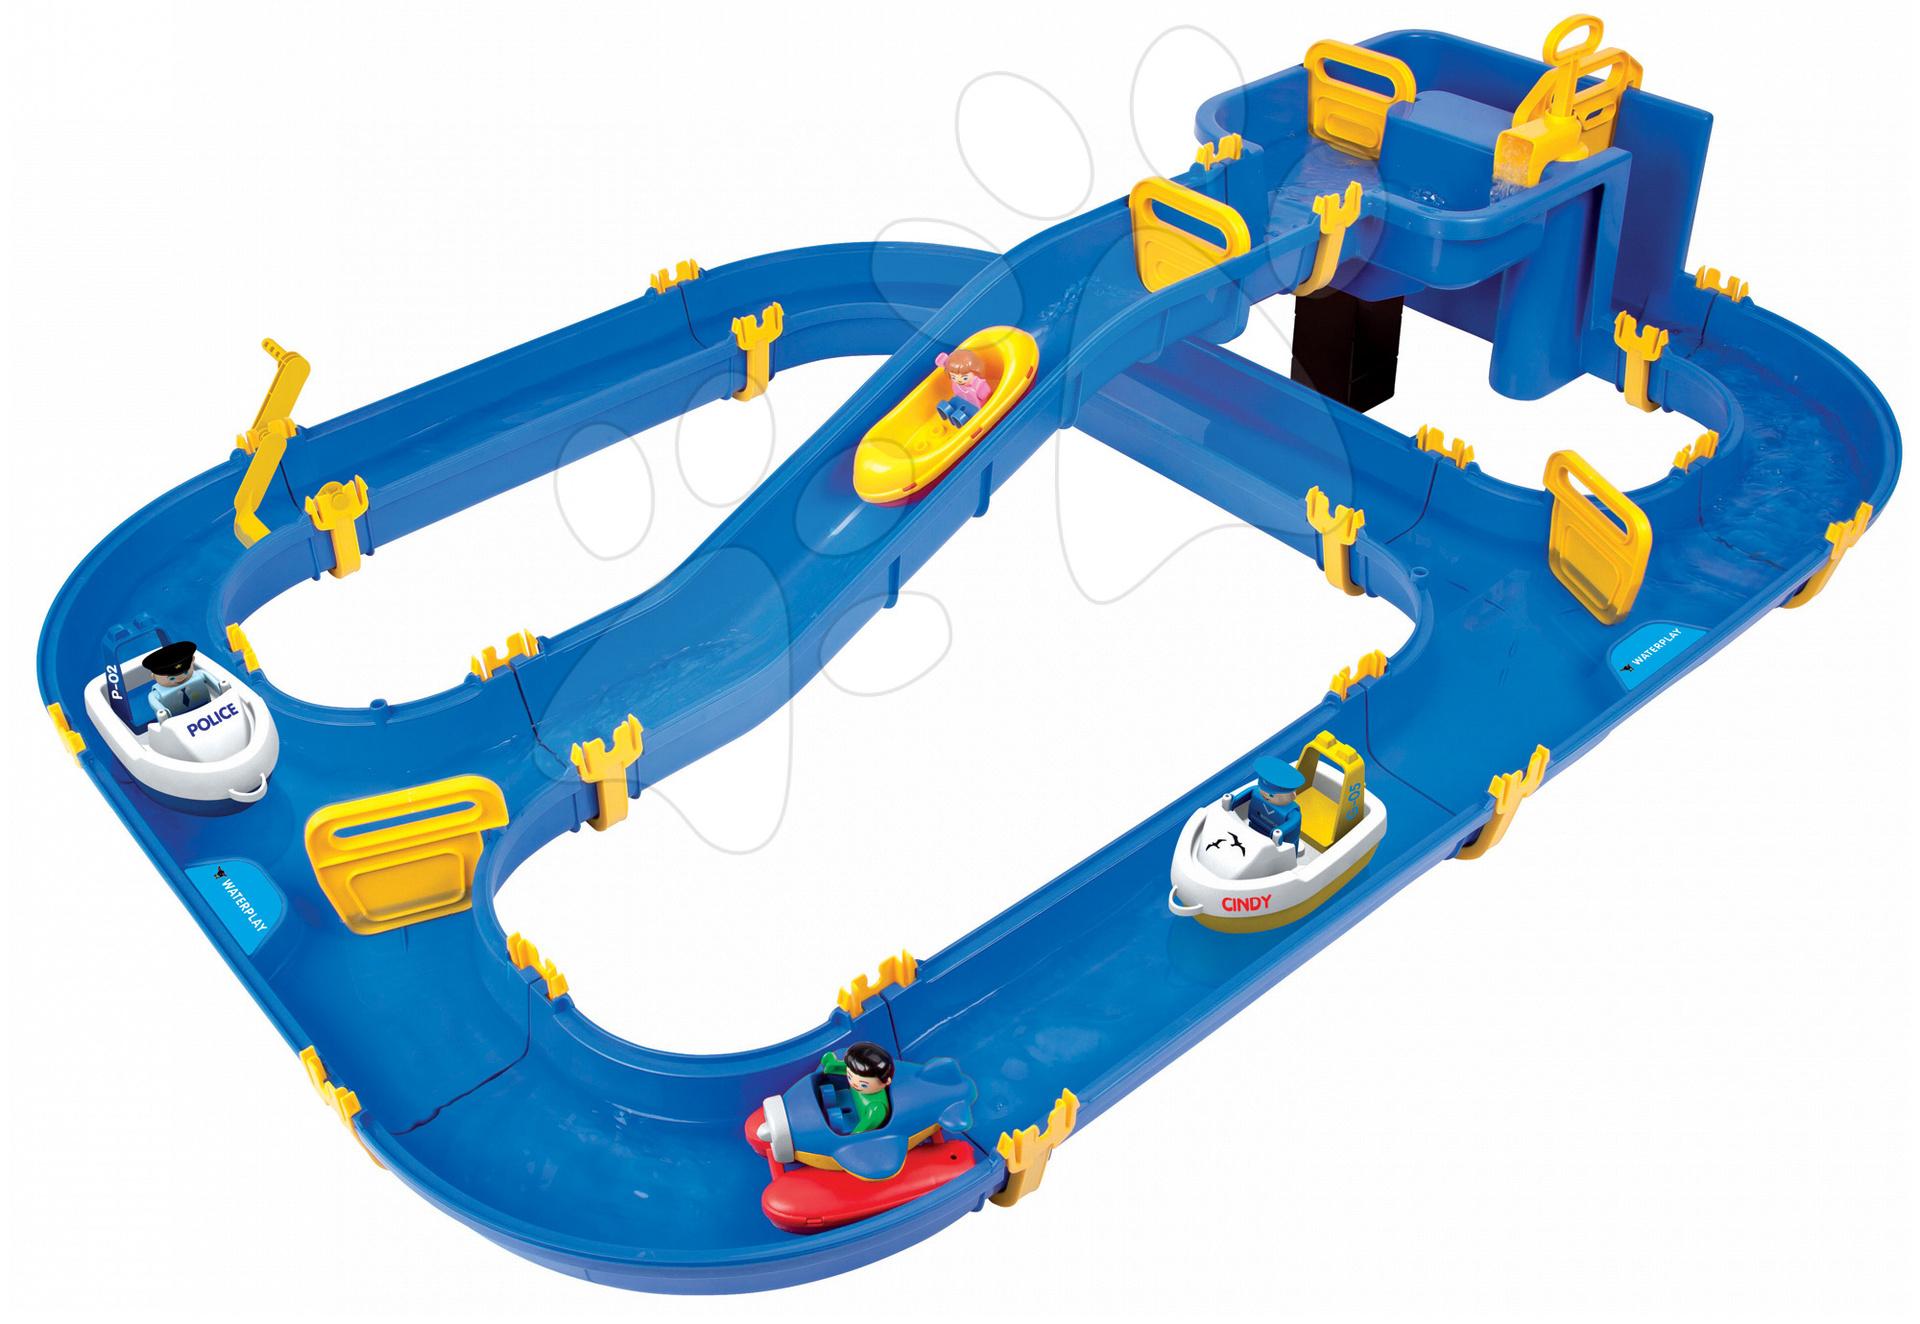 Vodna igra Waterplay Niagara BIG zložljiva z ladjicami modra